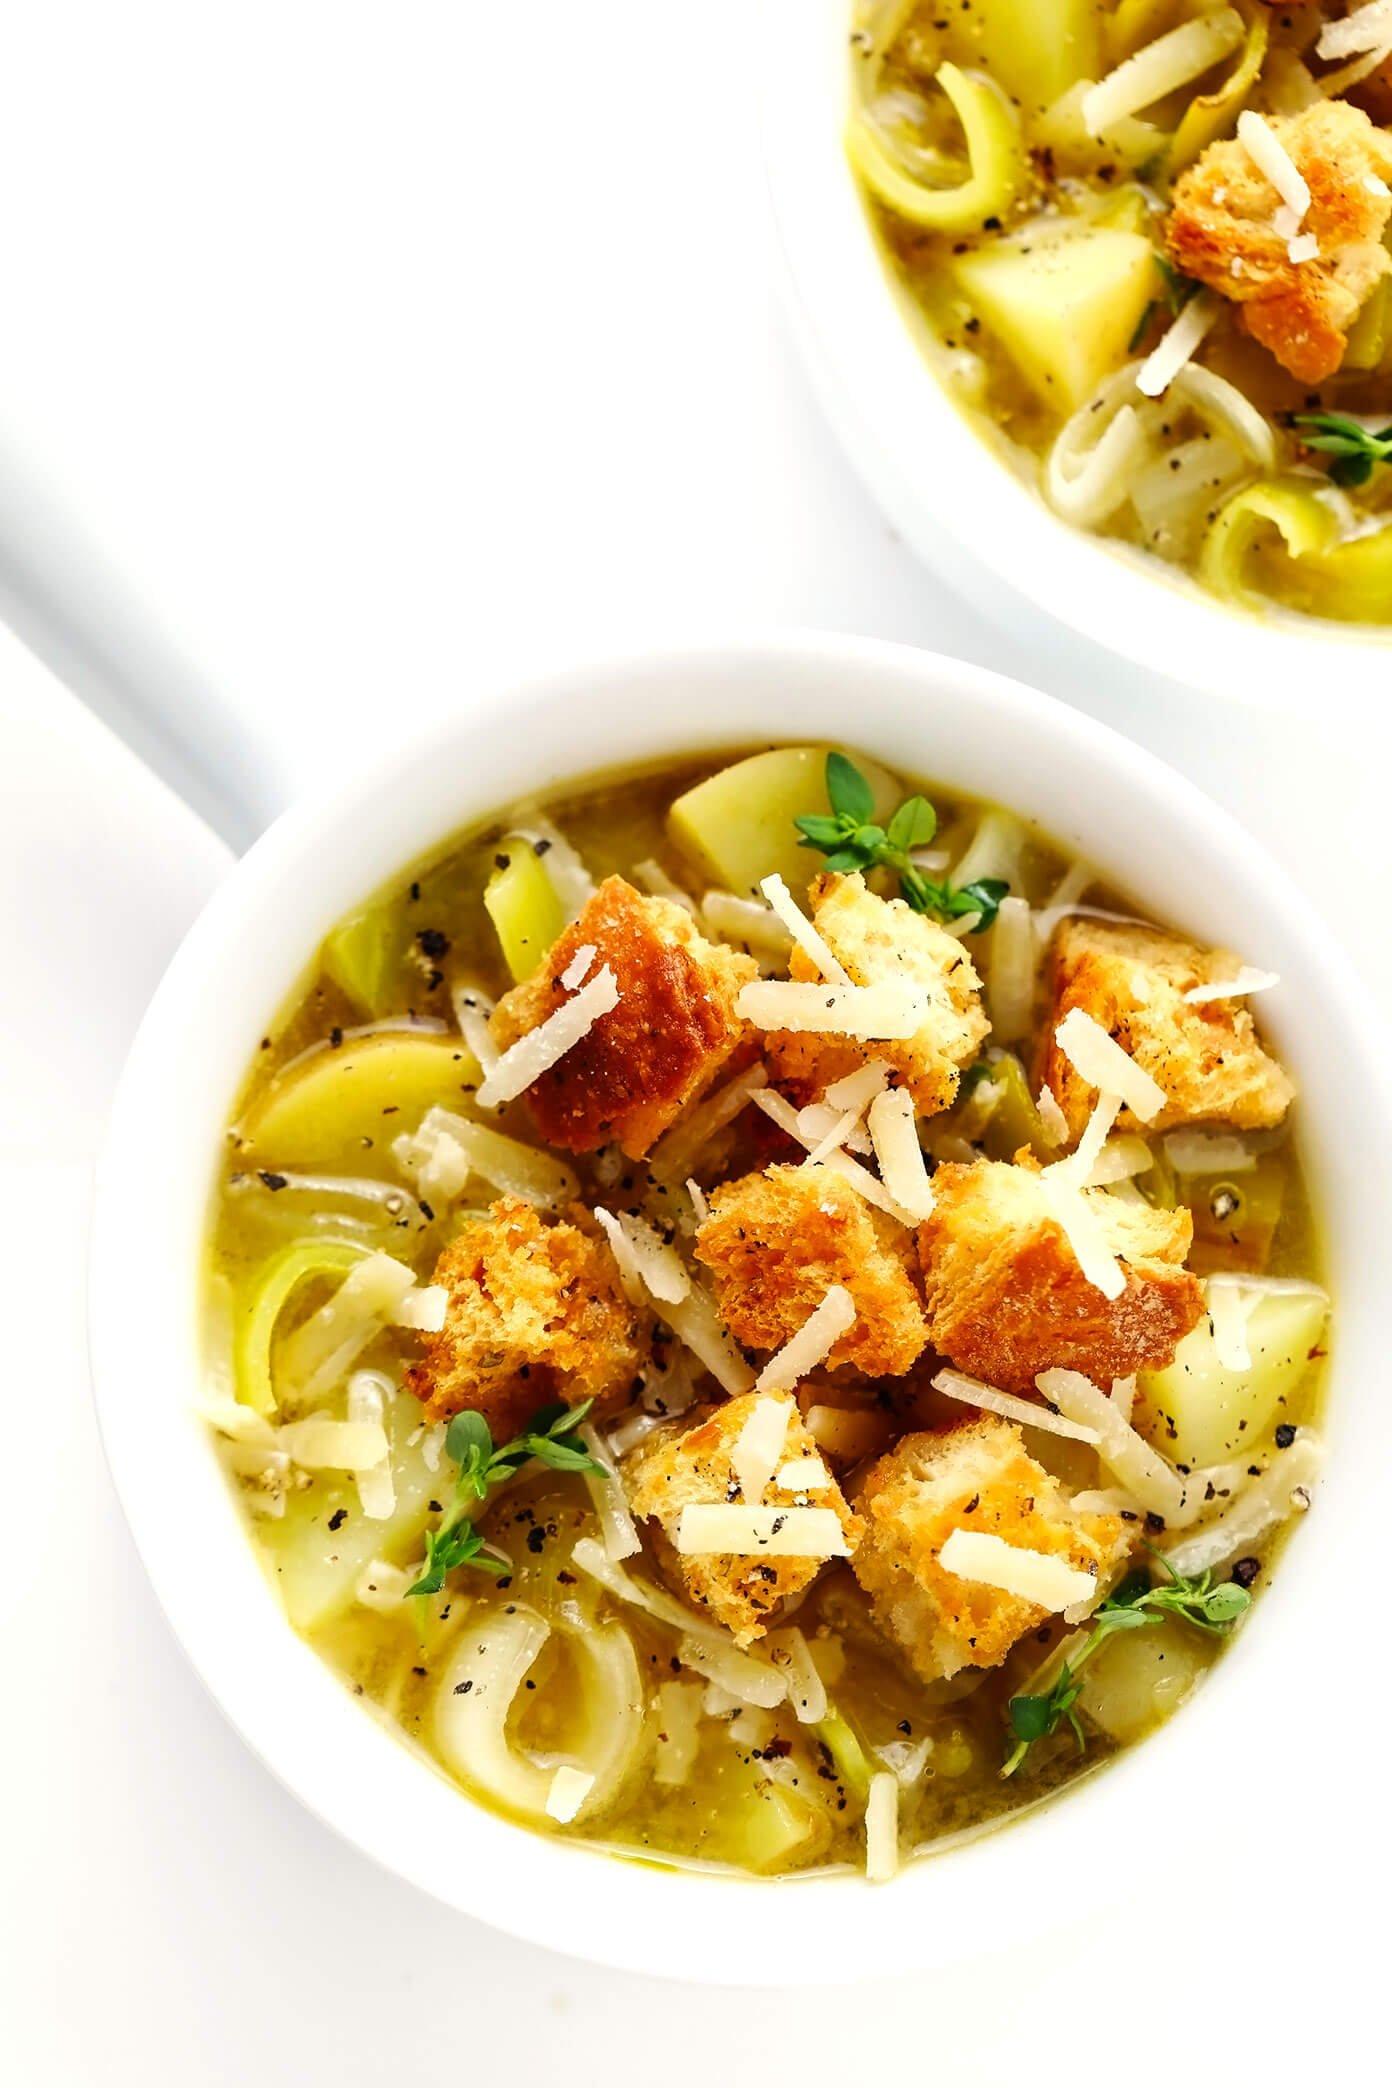 Rustic Potato Leek Soup Recipe